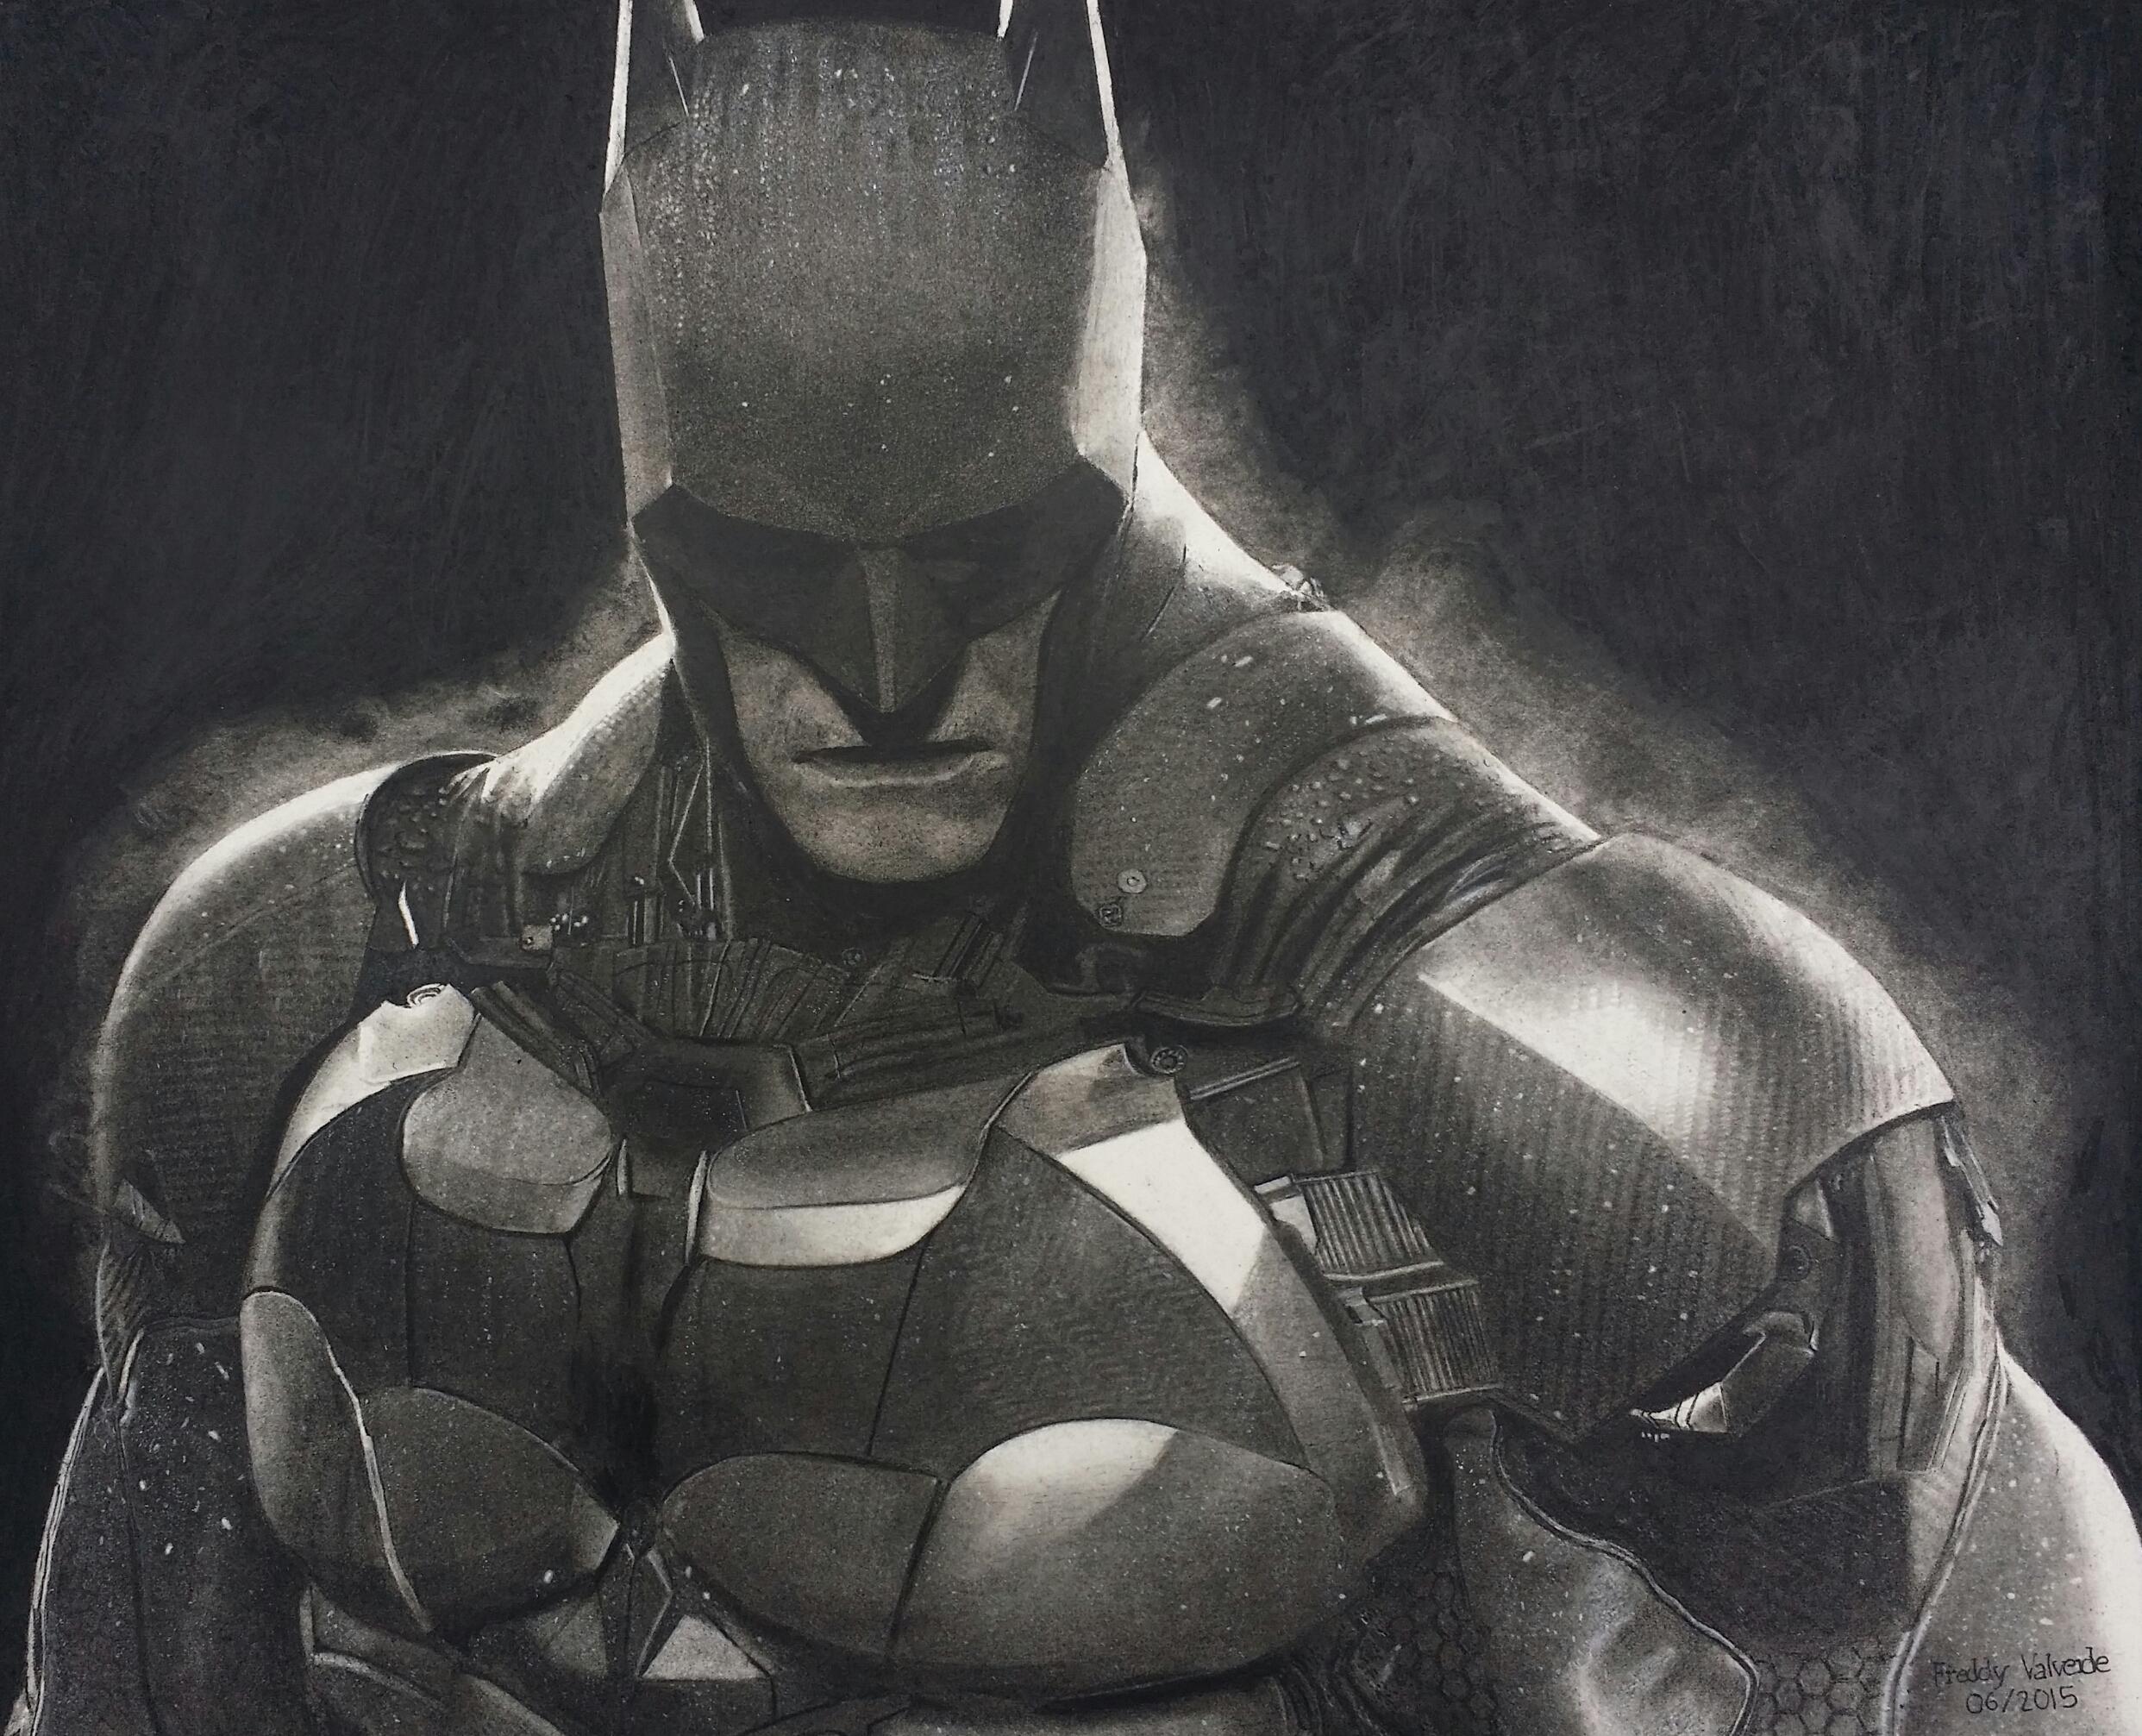 Batman Arkham Knight By Eddyvl On DeviantArt